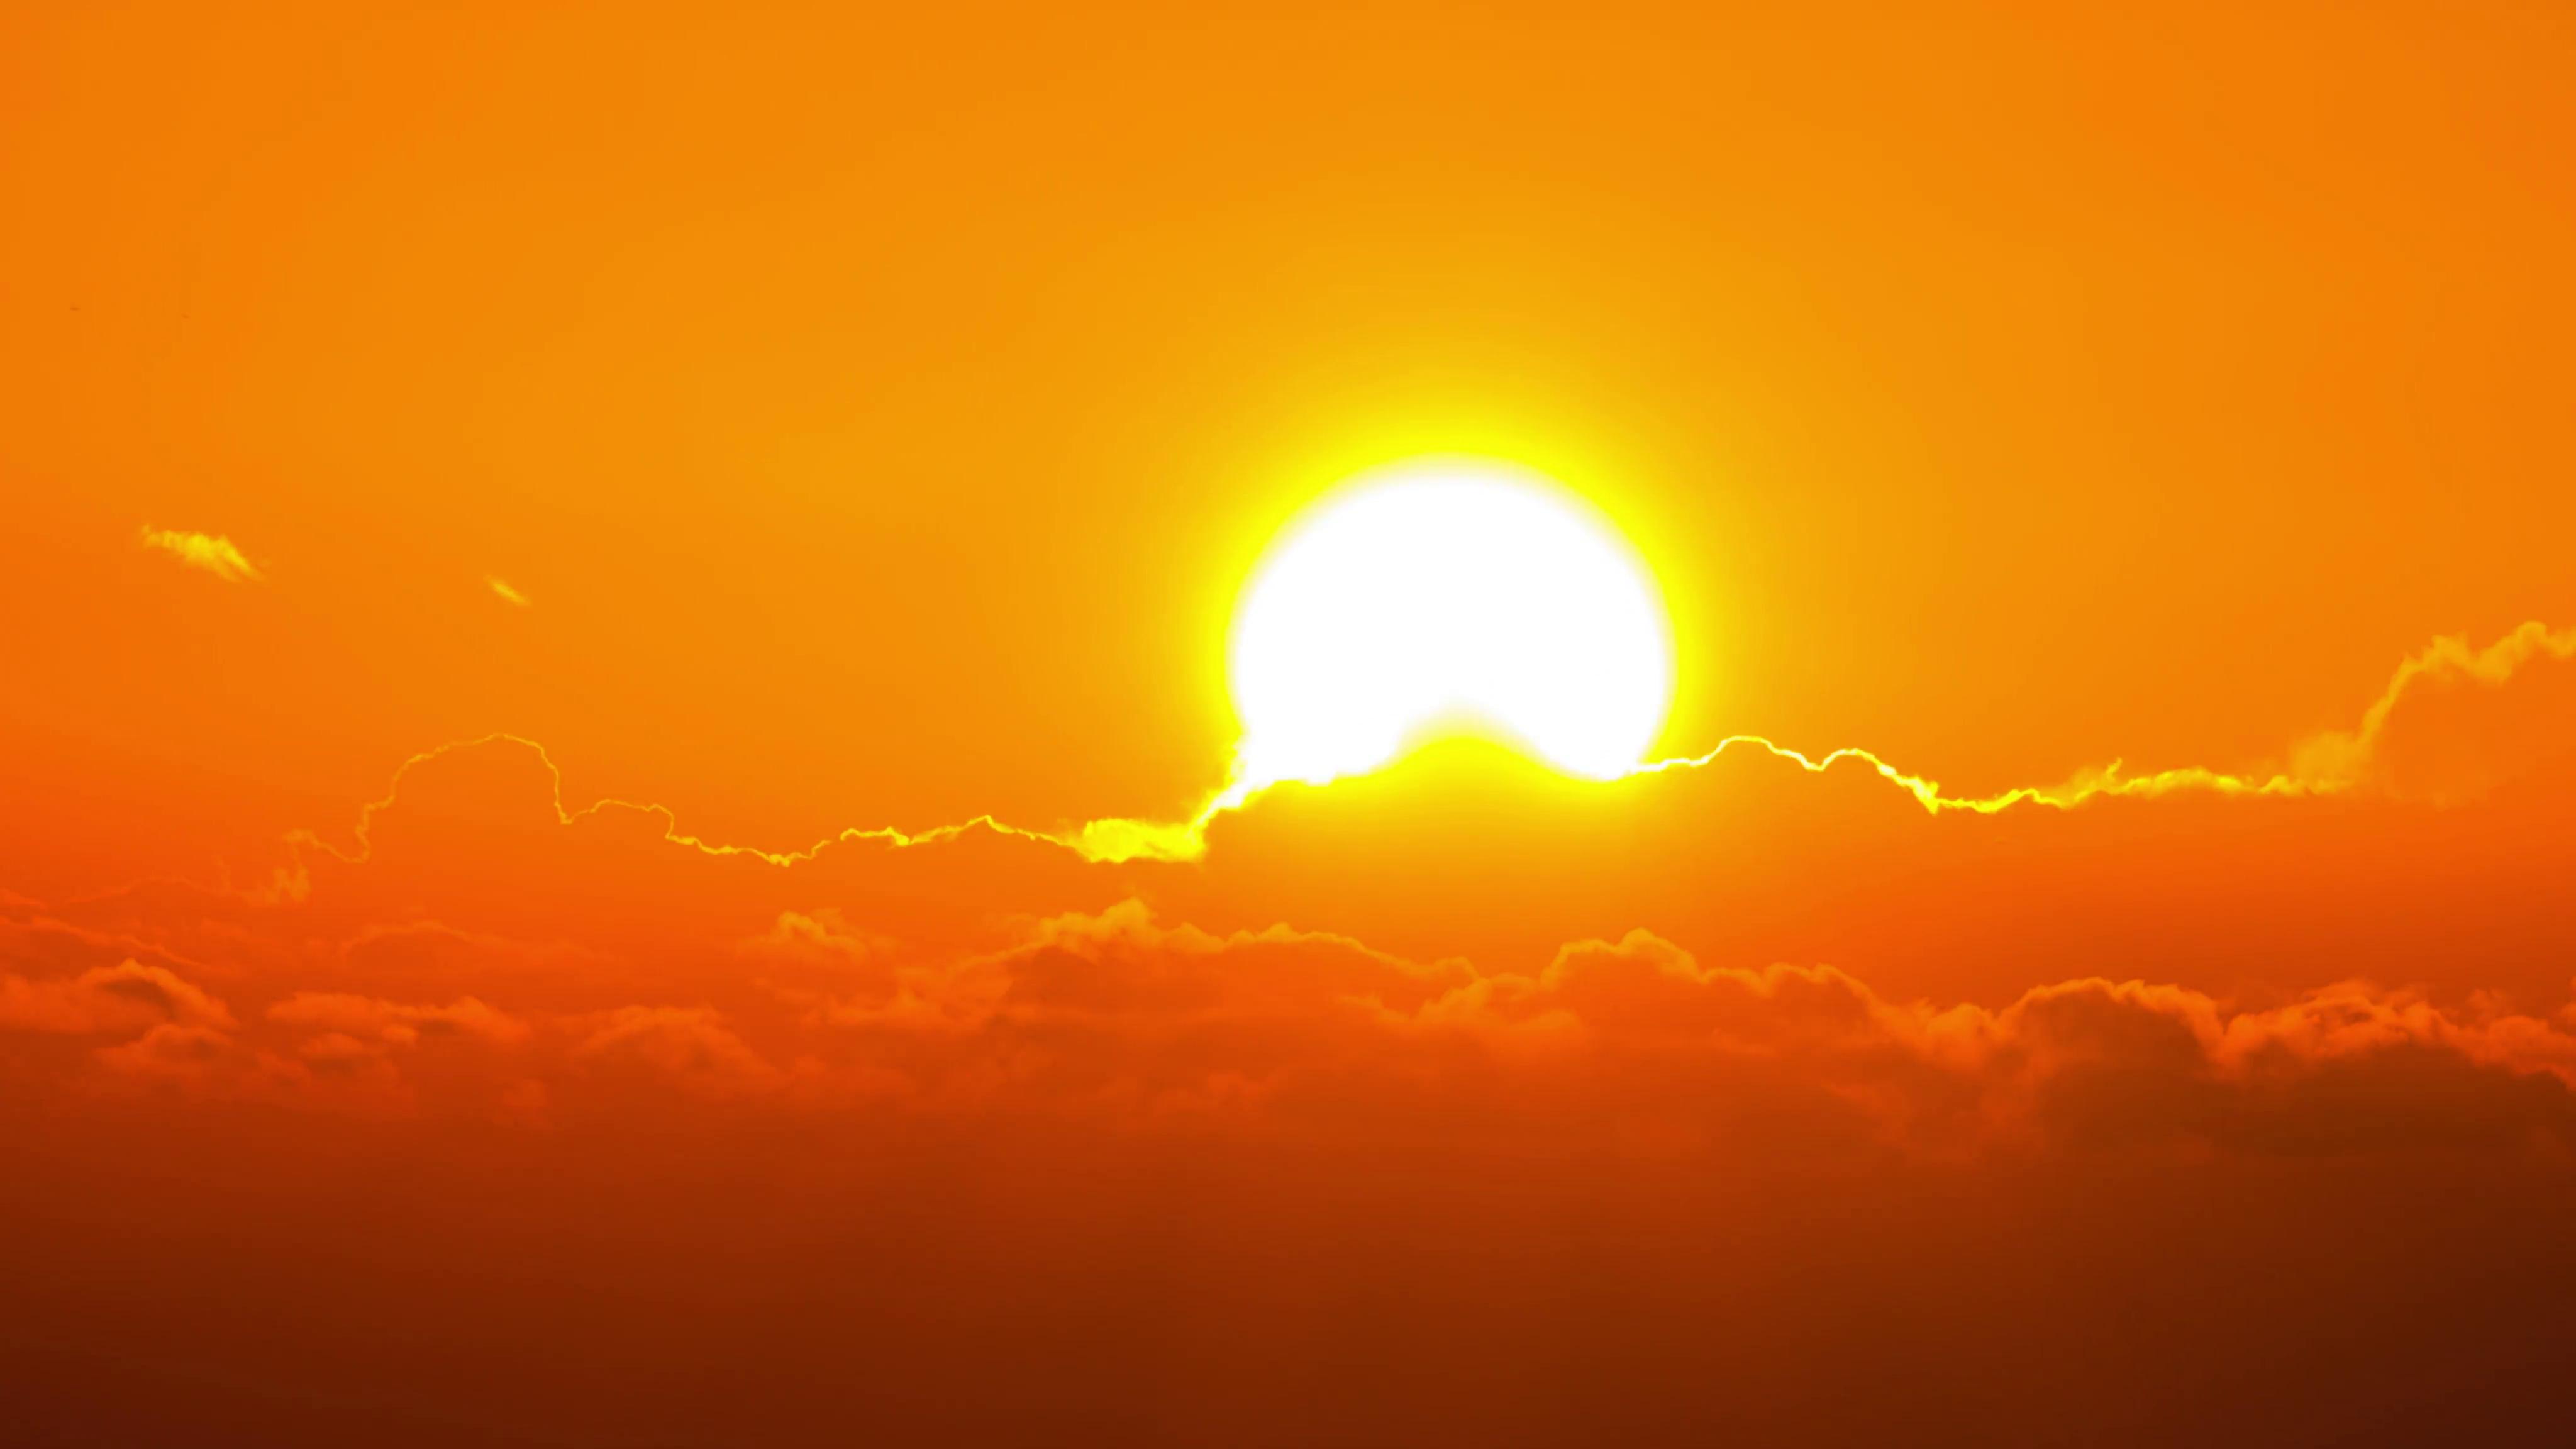 Sun HD PNG Transparent Sun HD.PNG Images #208680.